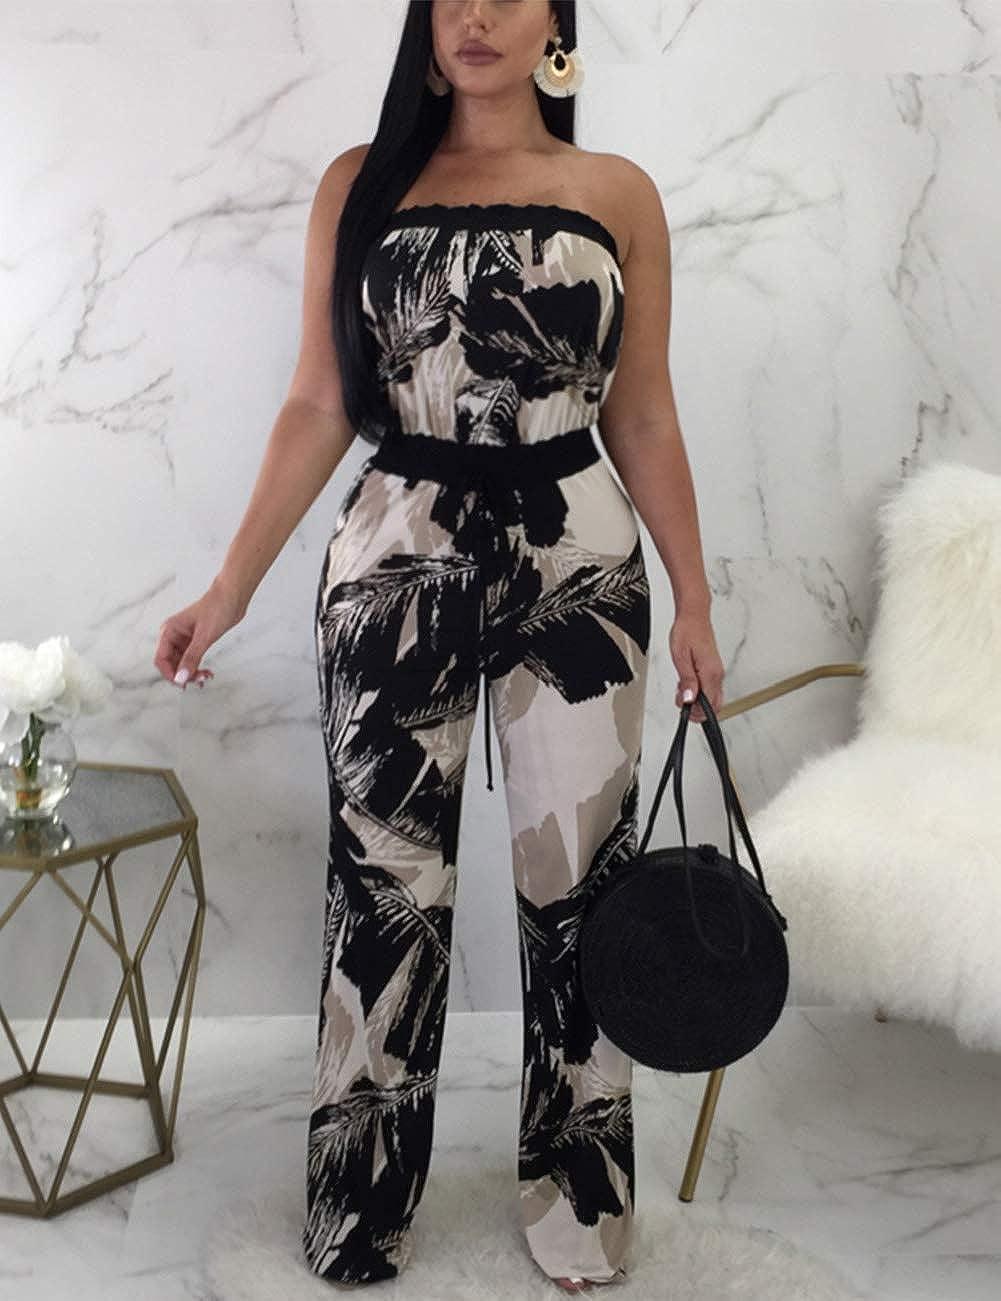 08559bbad38e Amazon.com  BOHISEN Women Sexy Off Shoulder Strapless Floral Wide Leg  Jumpsuit Romper Flare Palazzo Long Pants Set  Clothing